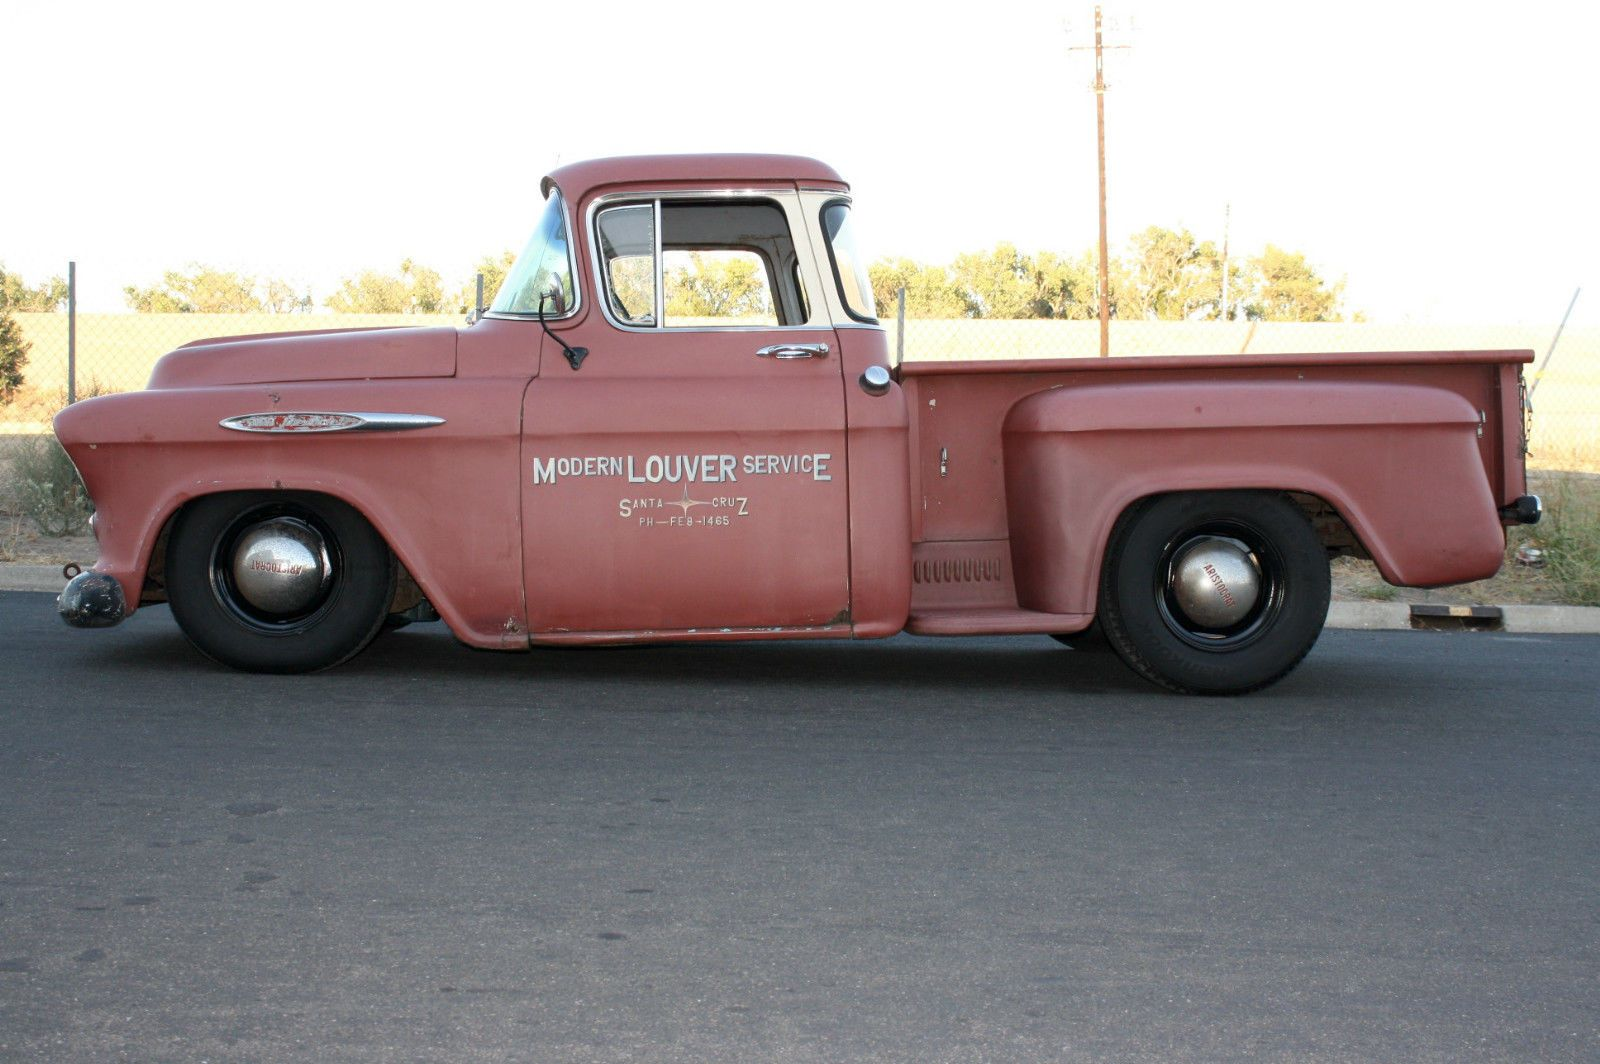 1957 Chevrolet Big Window V8 Pickup 3100 Daily Driver California Truck | eBay